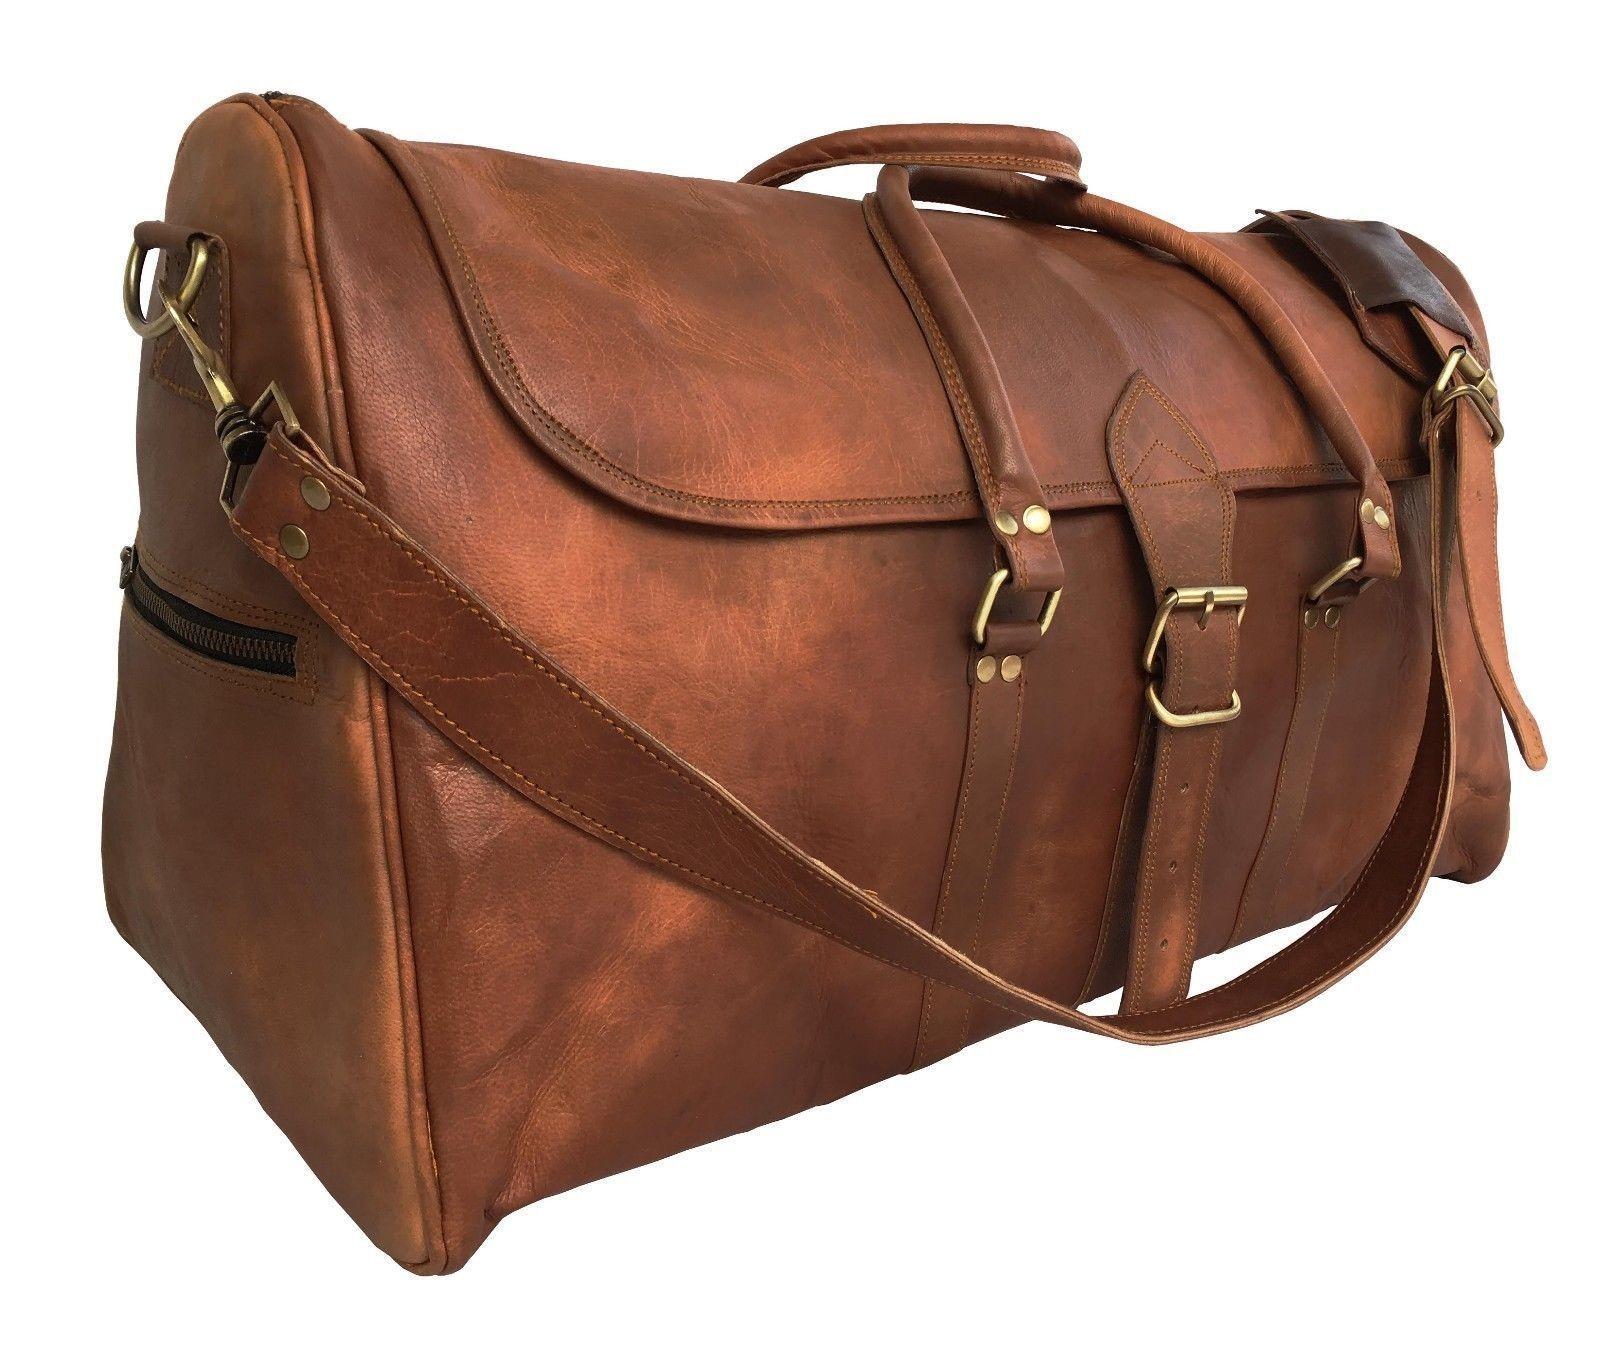 805e1d9a0f2be ... 28f98468f4ee4 PH998 TRIANGULAR II LESACK™ Skórzana torba podróżna na  ramię.